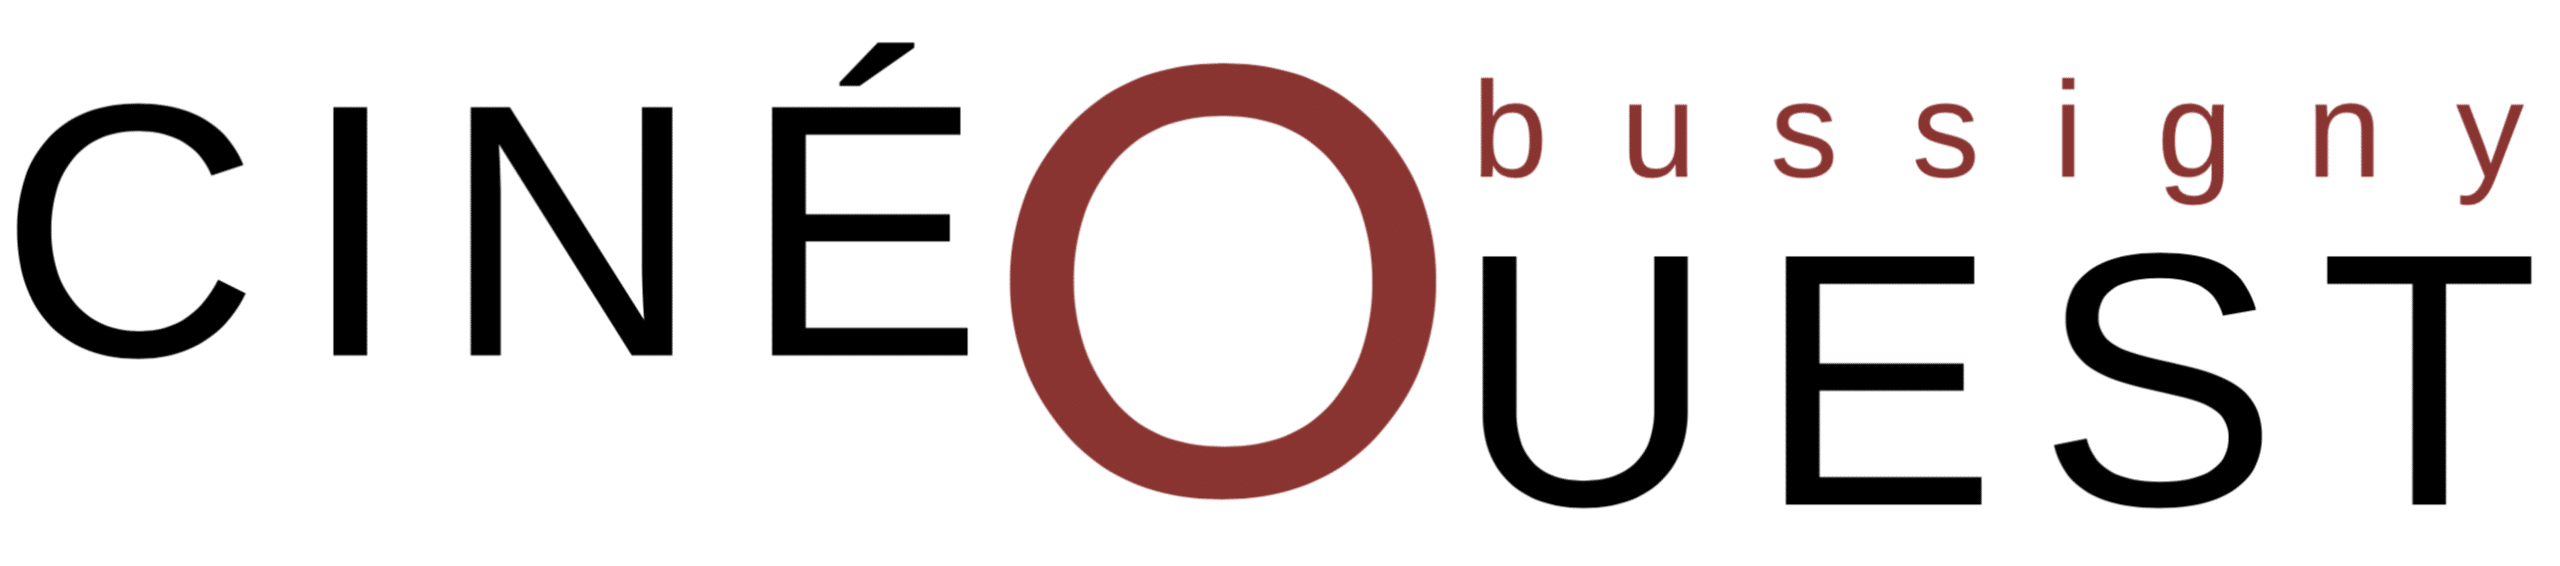 cinéOuest bussigny